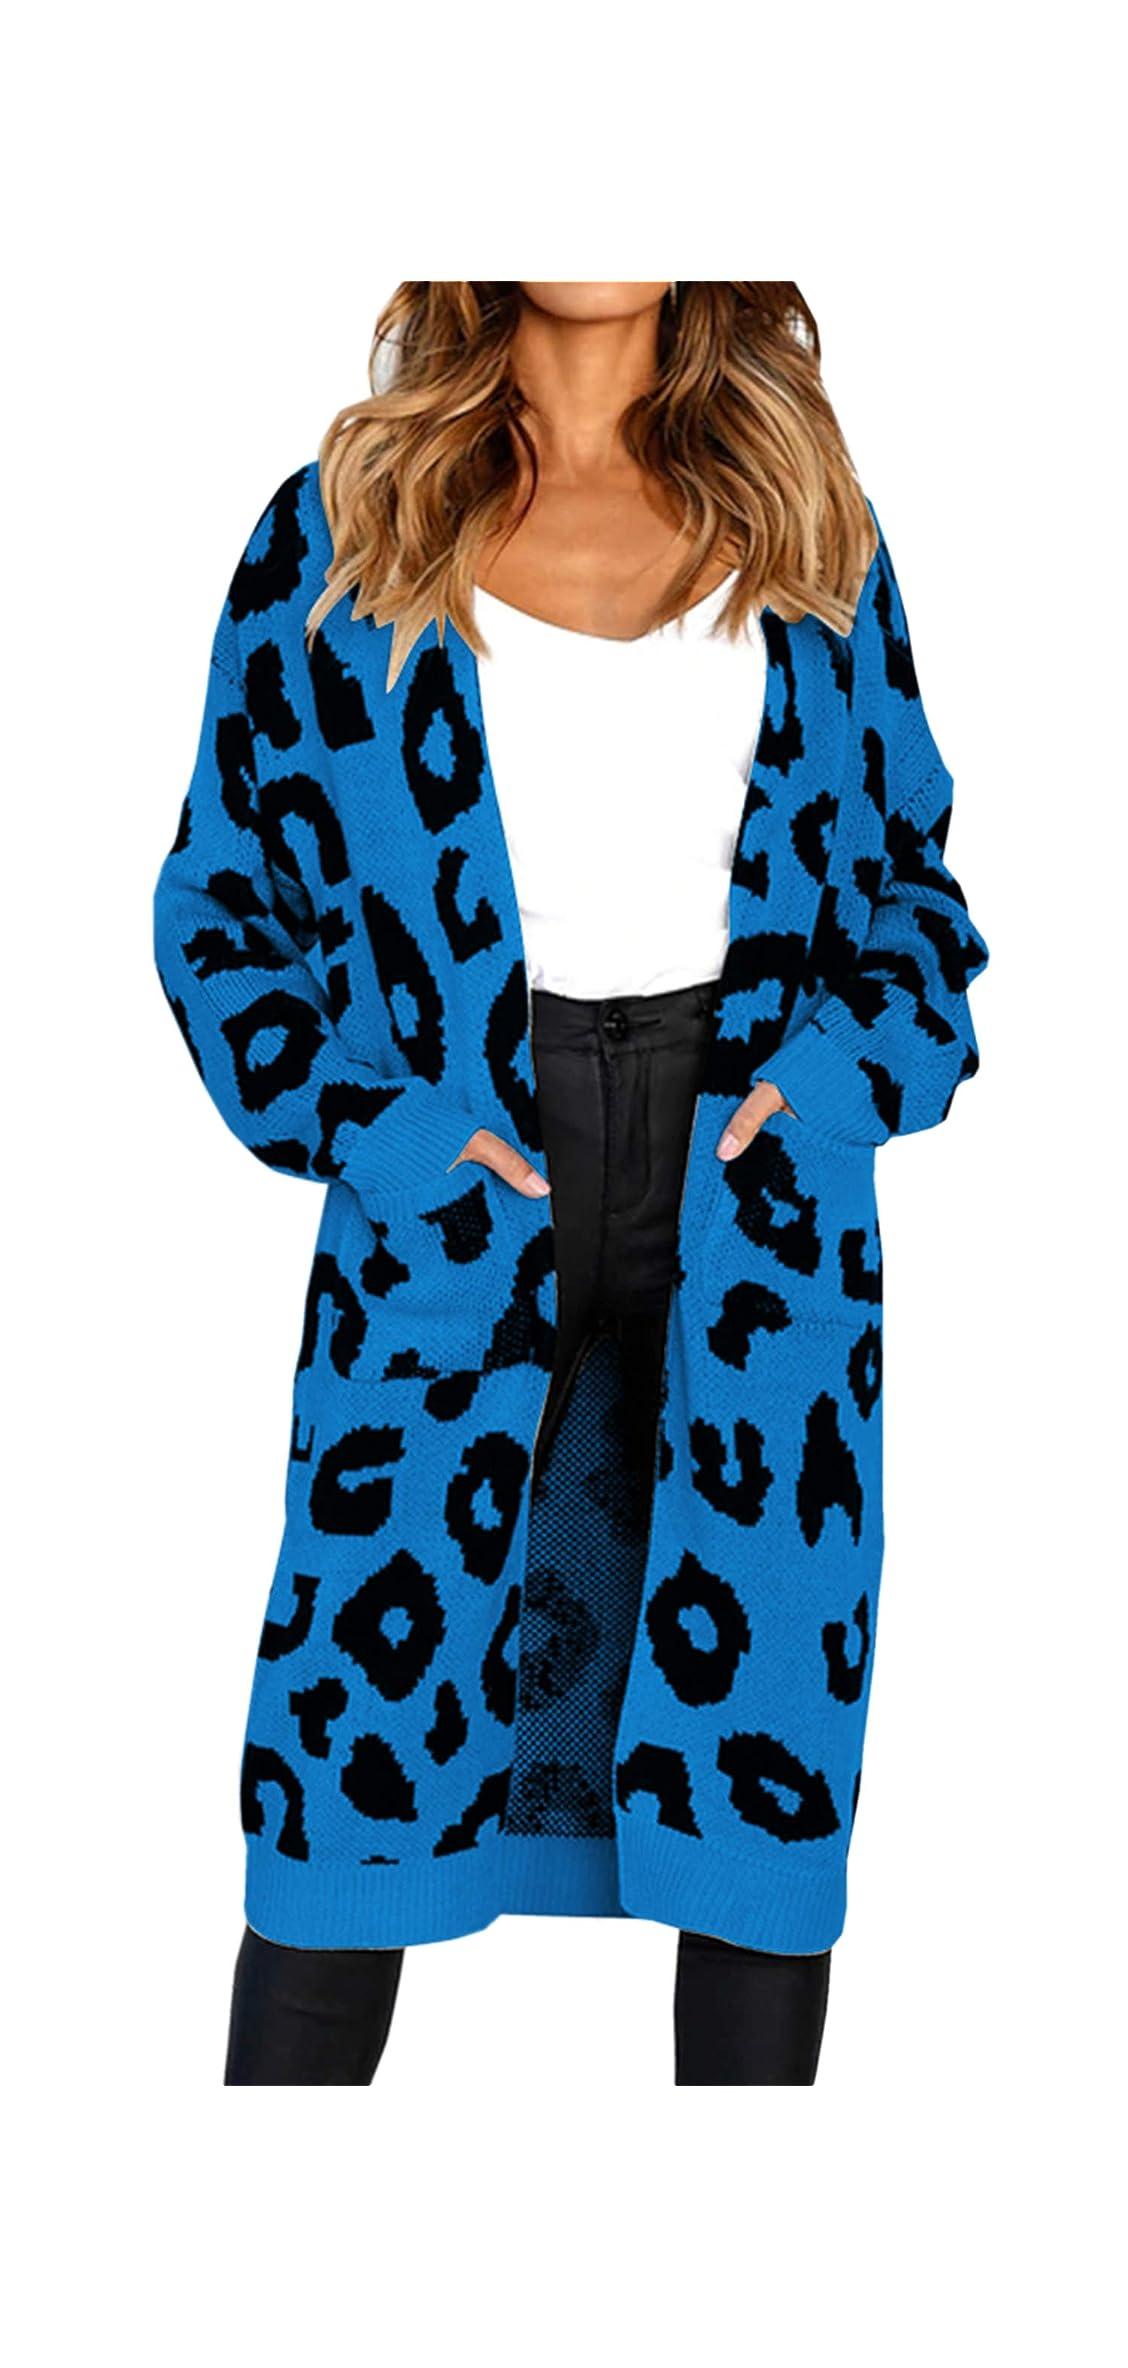 Women's Long Sleeves Leopard Print Knitting Cardigan